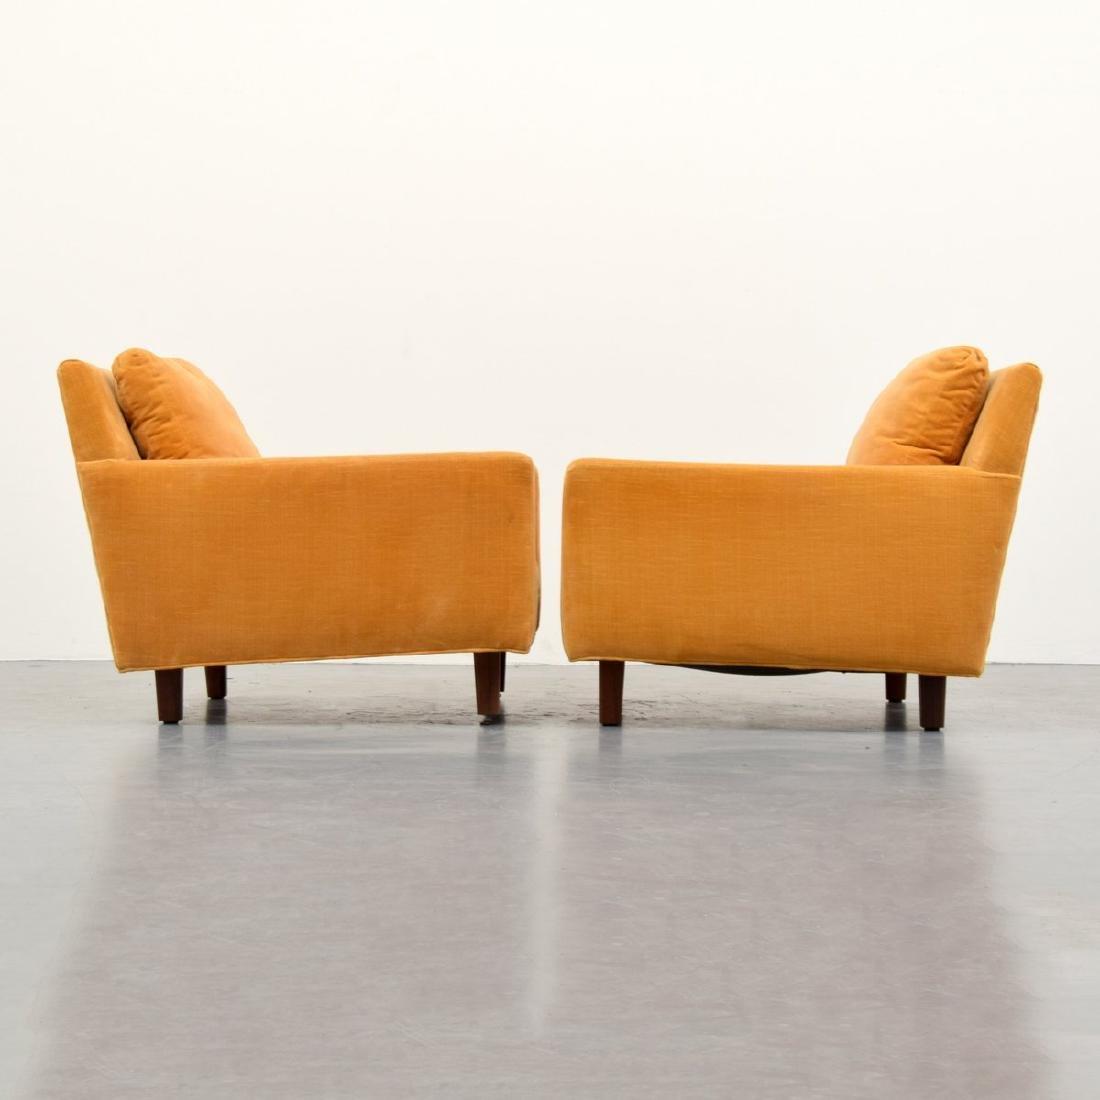 Pair of Milo Baughman Lounge Chairs - 4